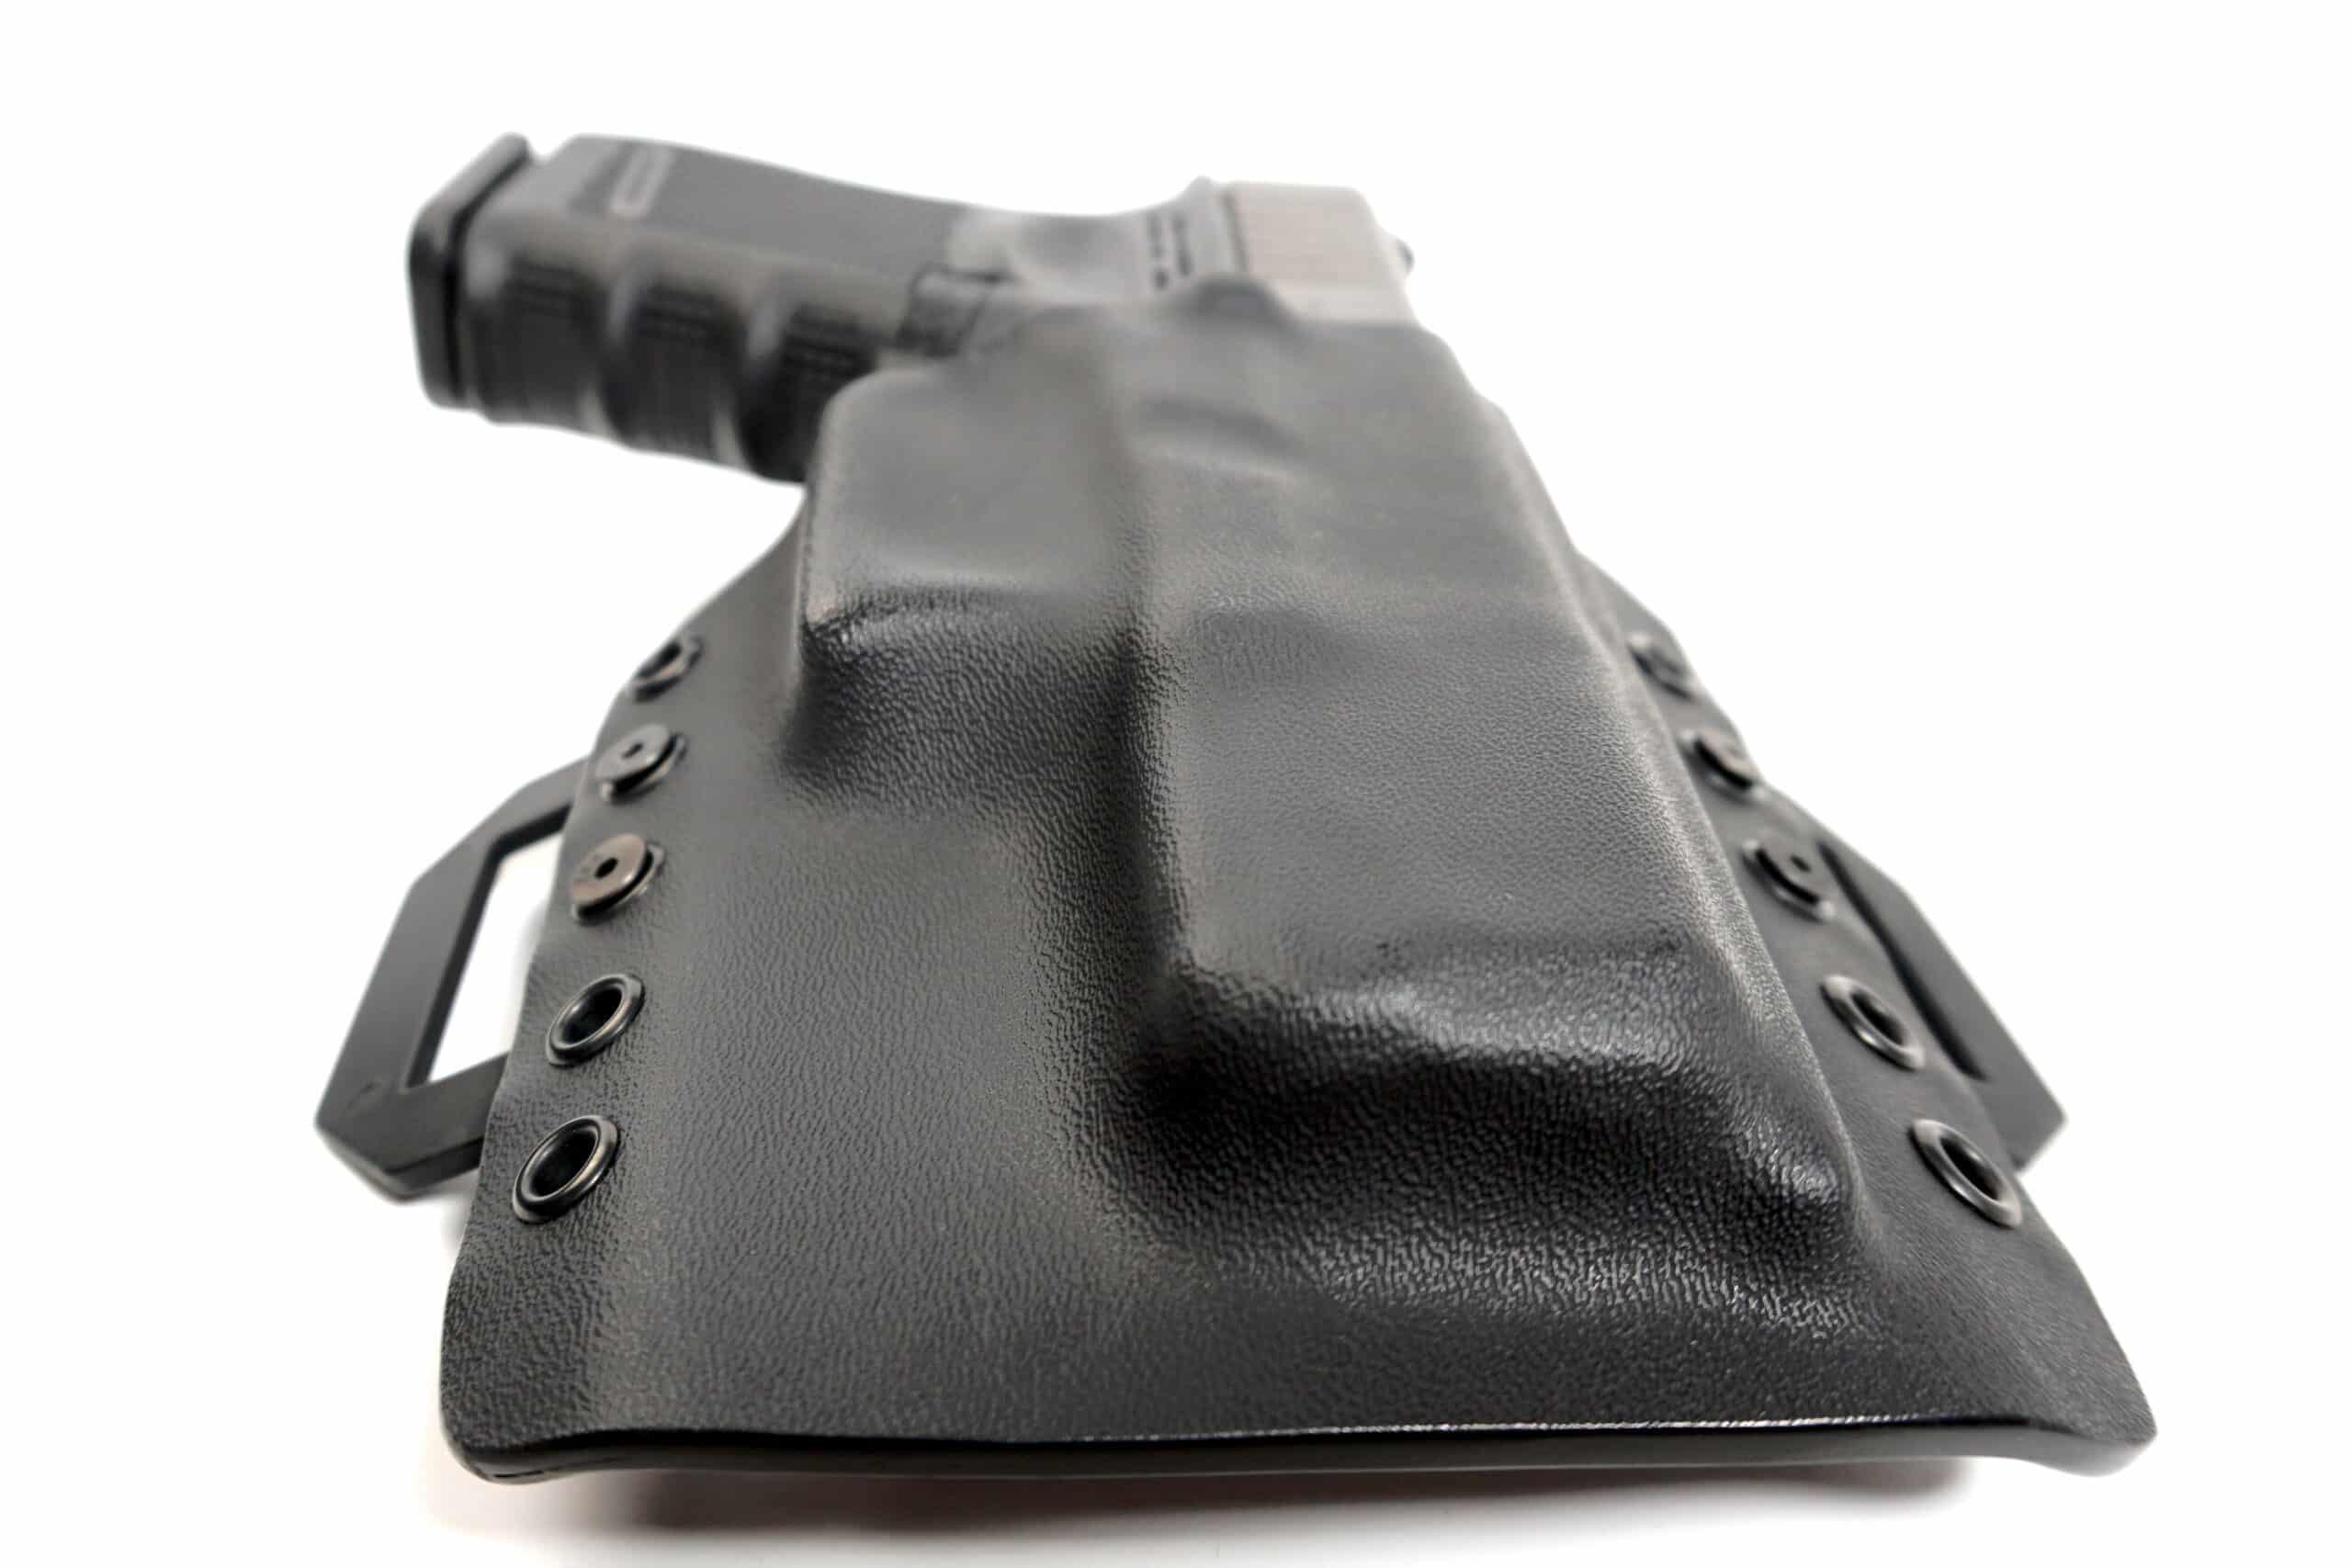 Beretta PX4 Storm Compact OWB Kydex Holster